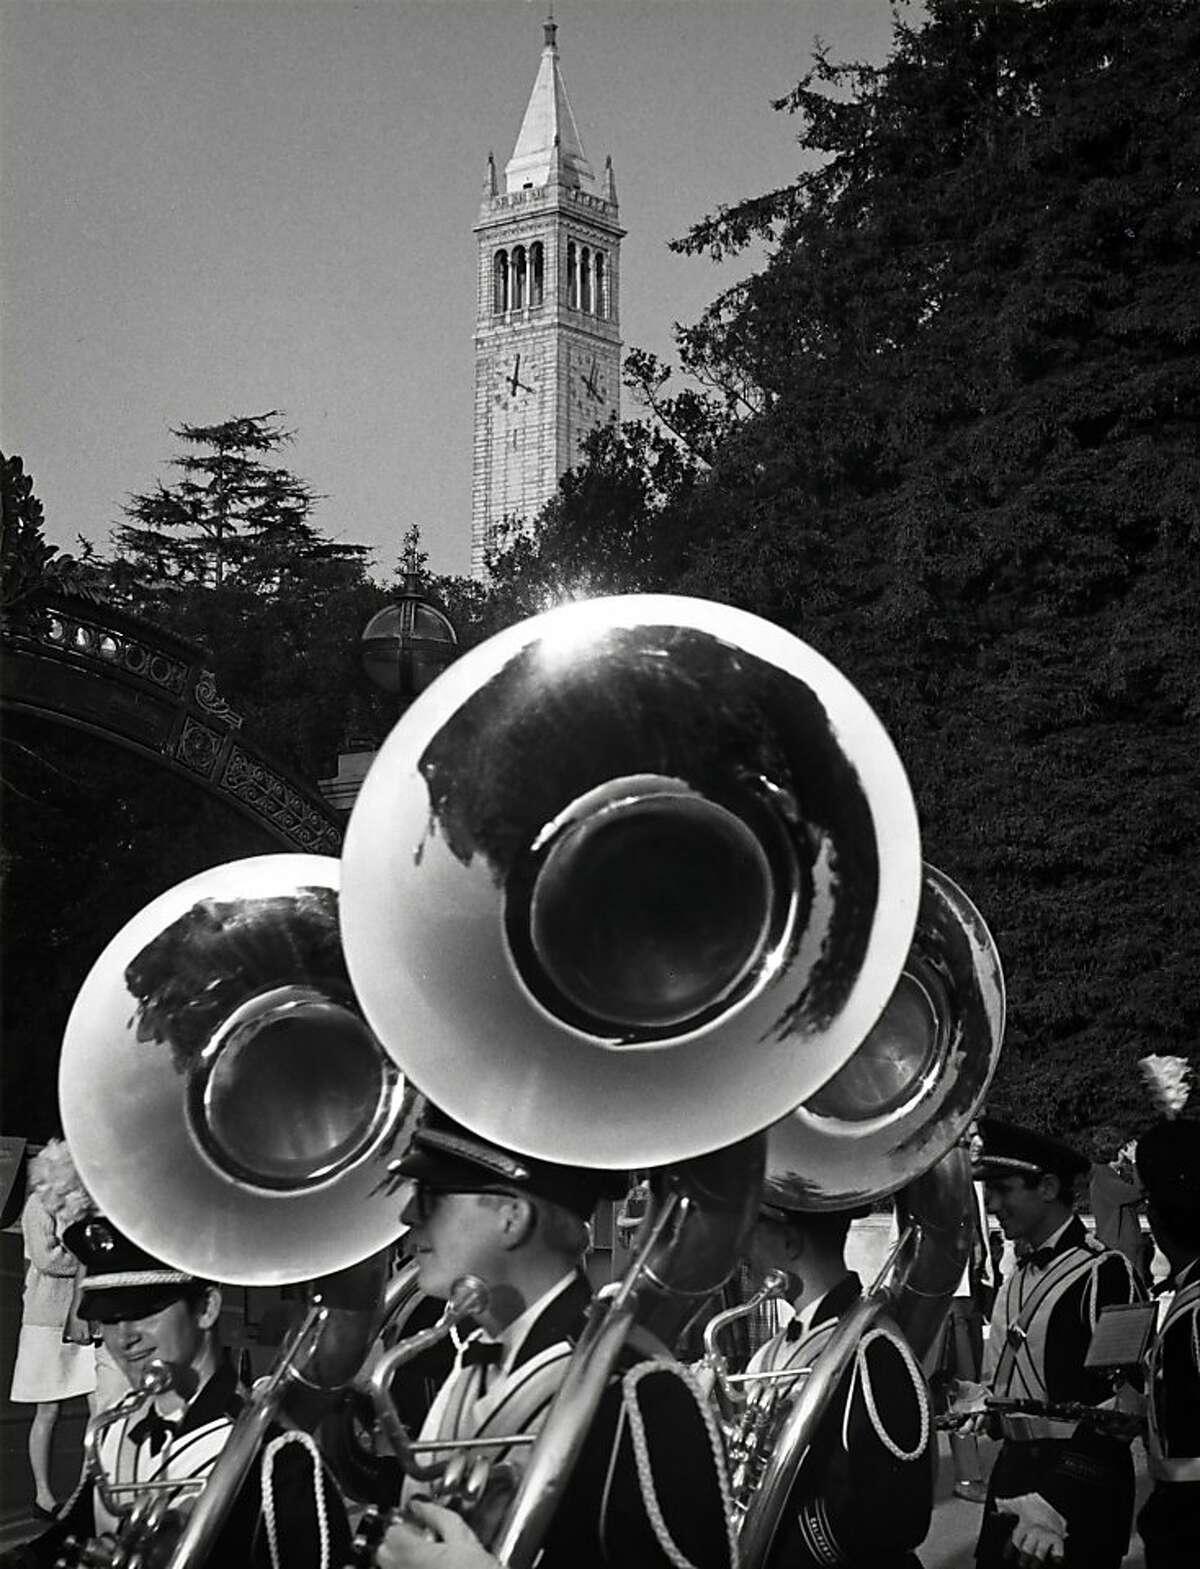 Fiat Lux Pre-football game parade, UC Berkeley, 1966.